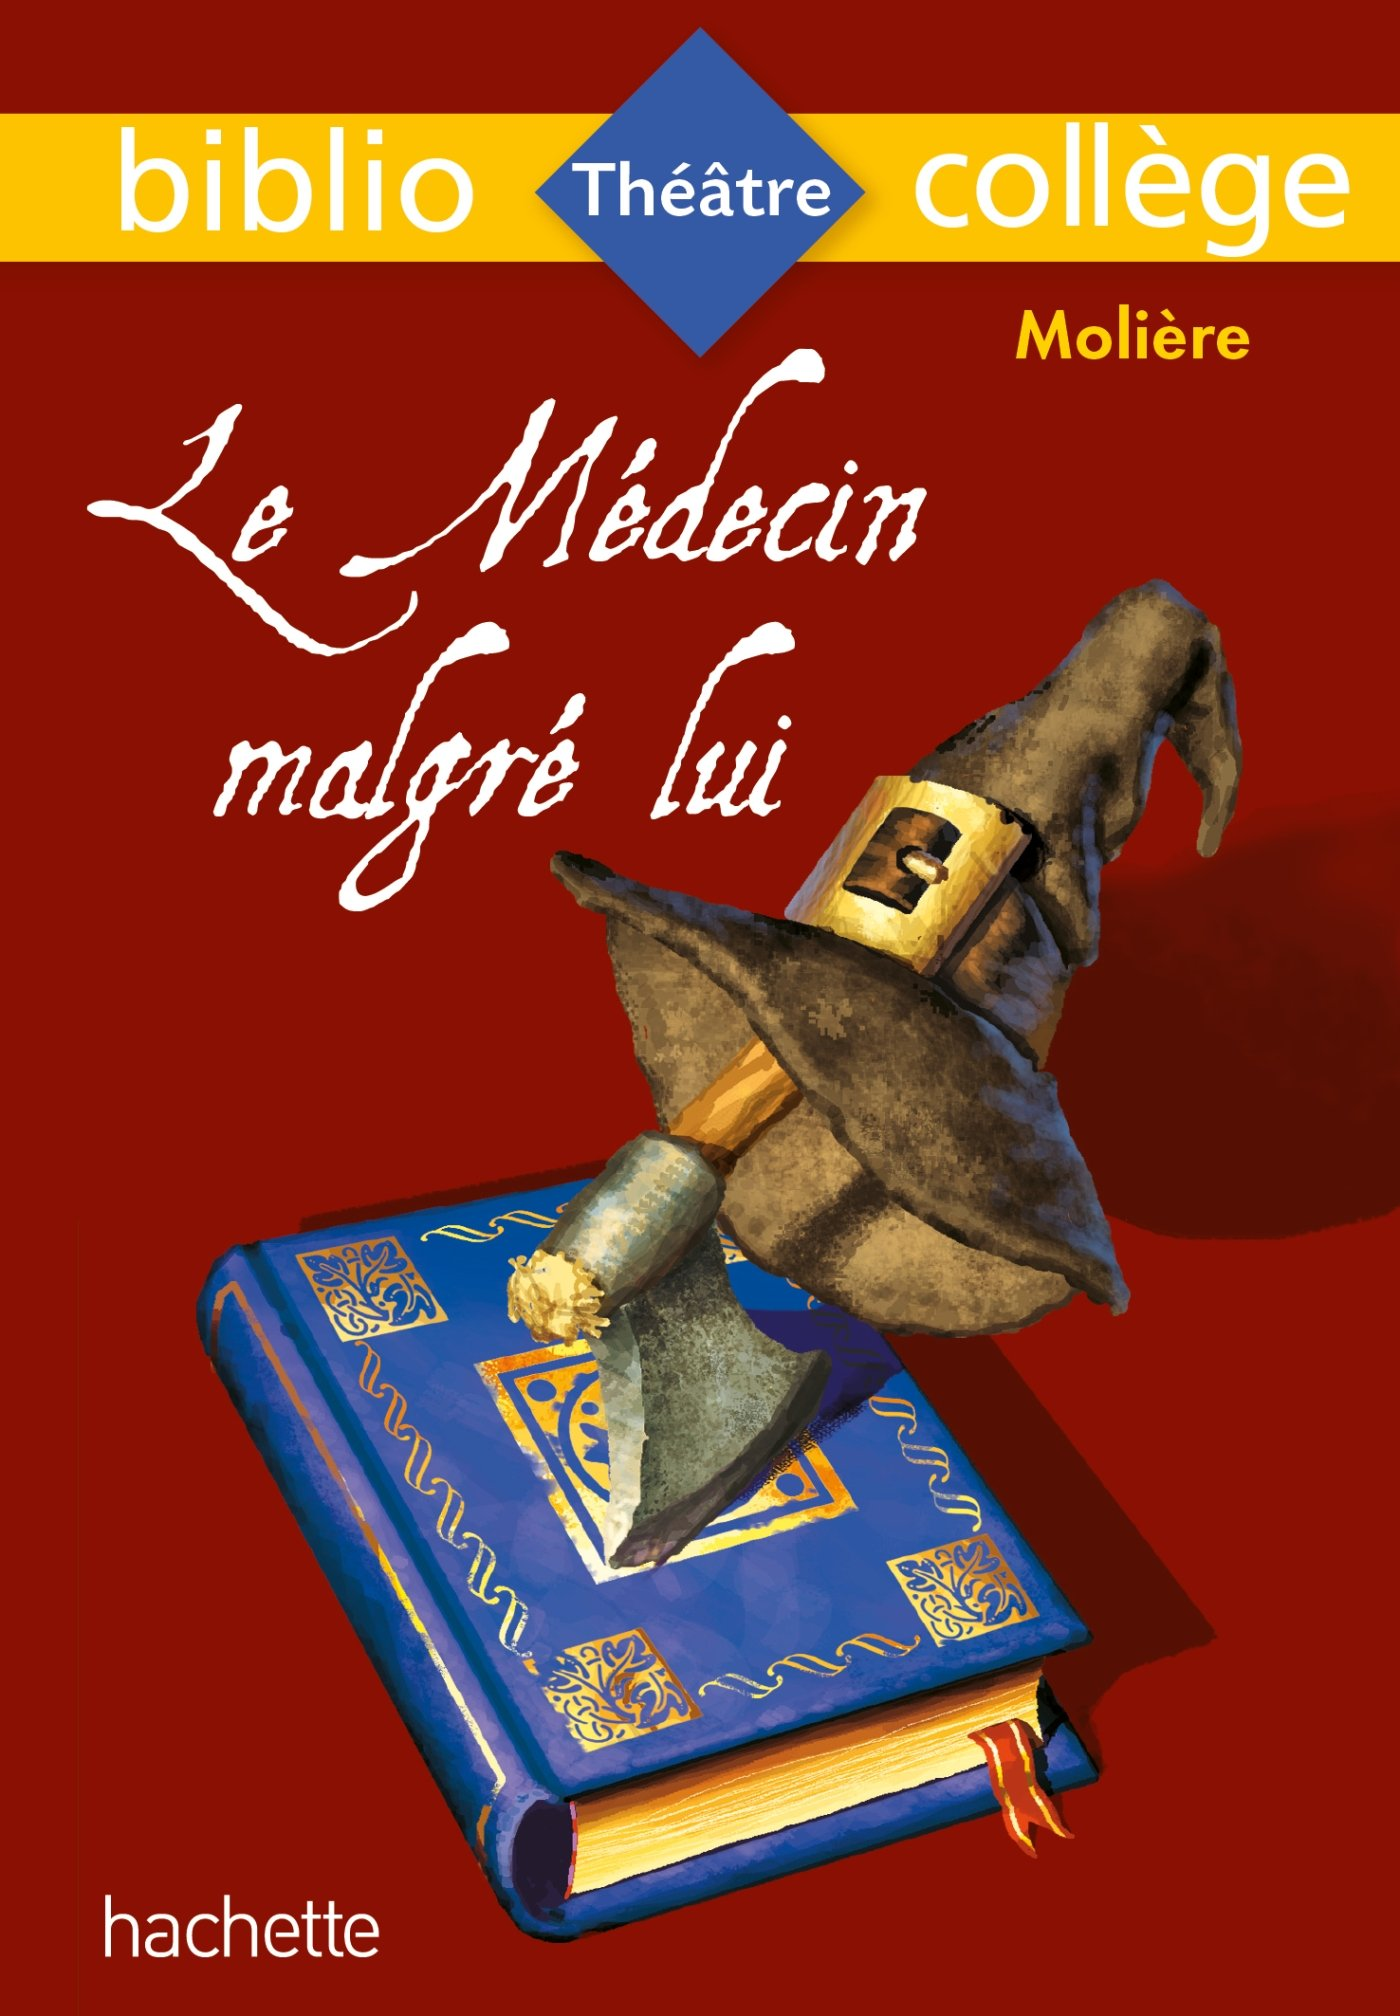 Metier De Moliere